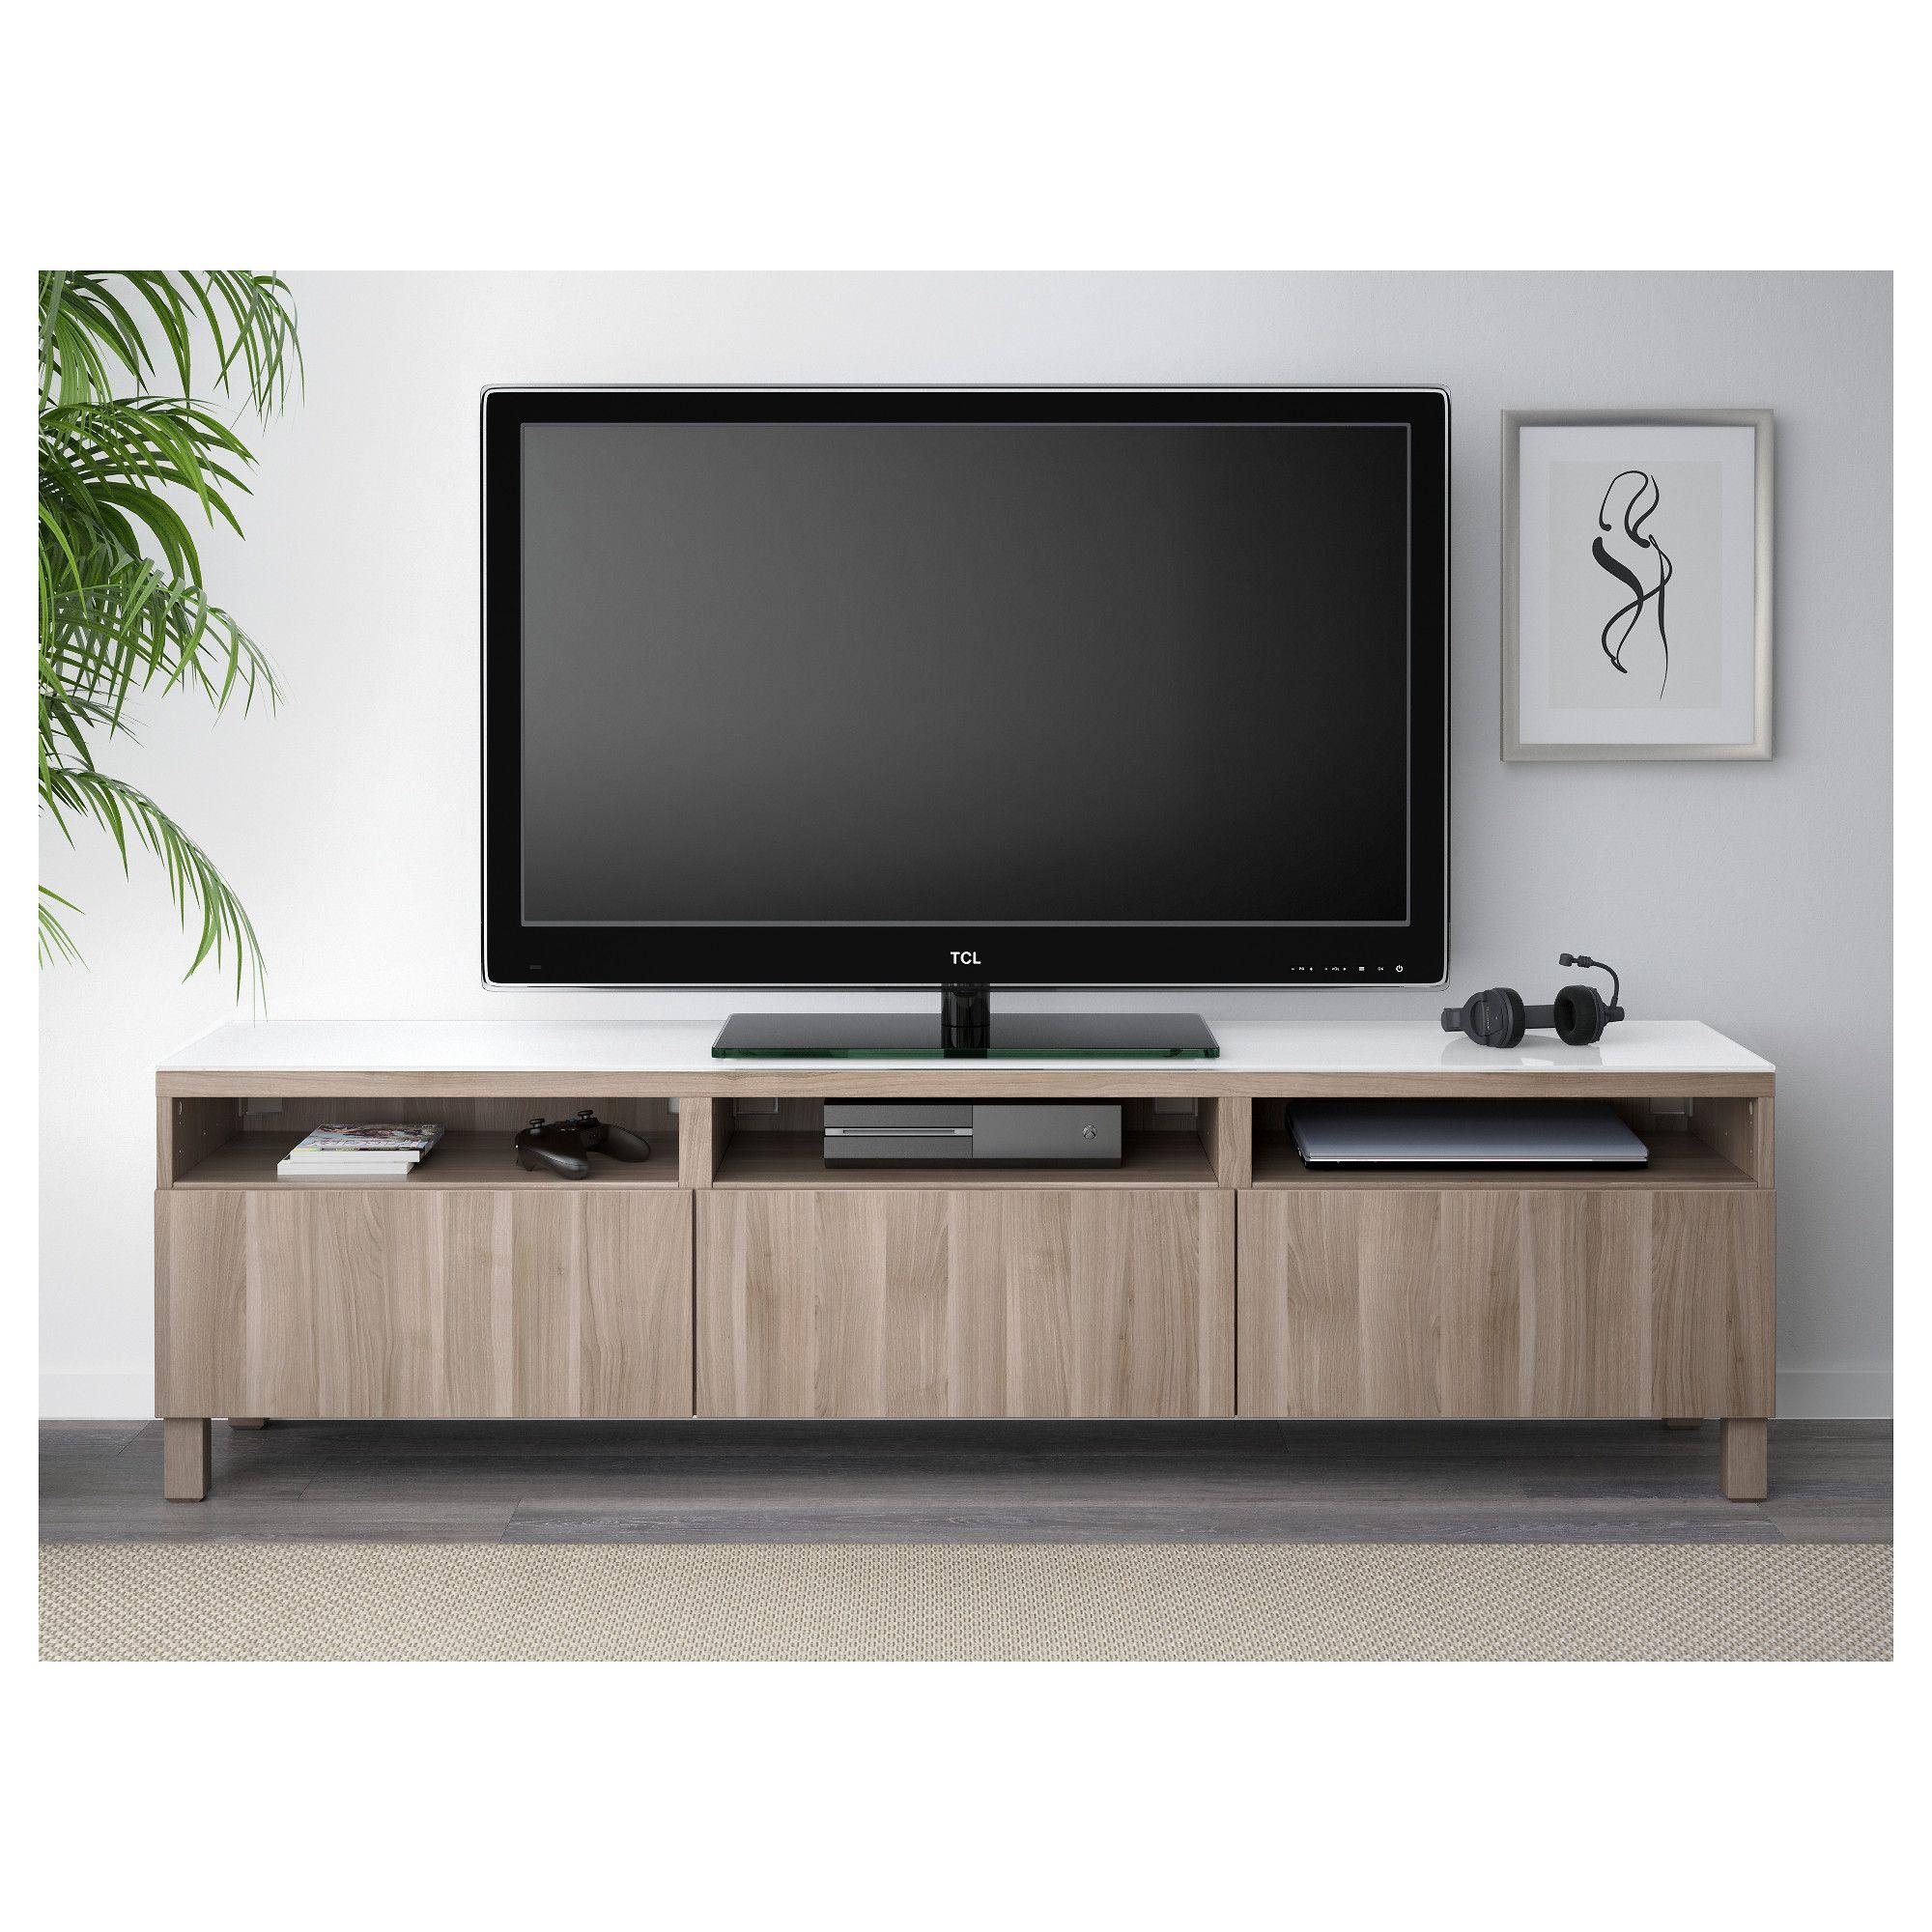 Meuble Ikea Besta Blanc bestÅ tv unit with drawers - lappviken gray stained walnut